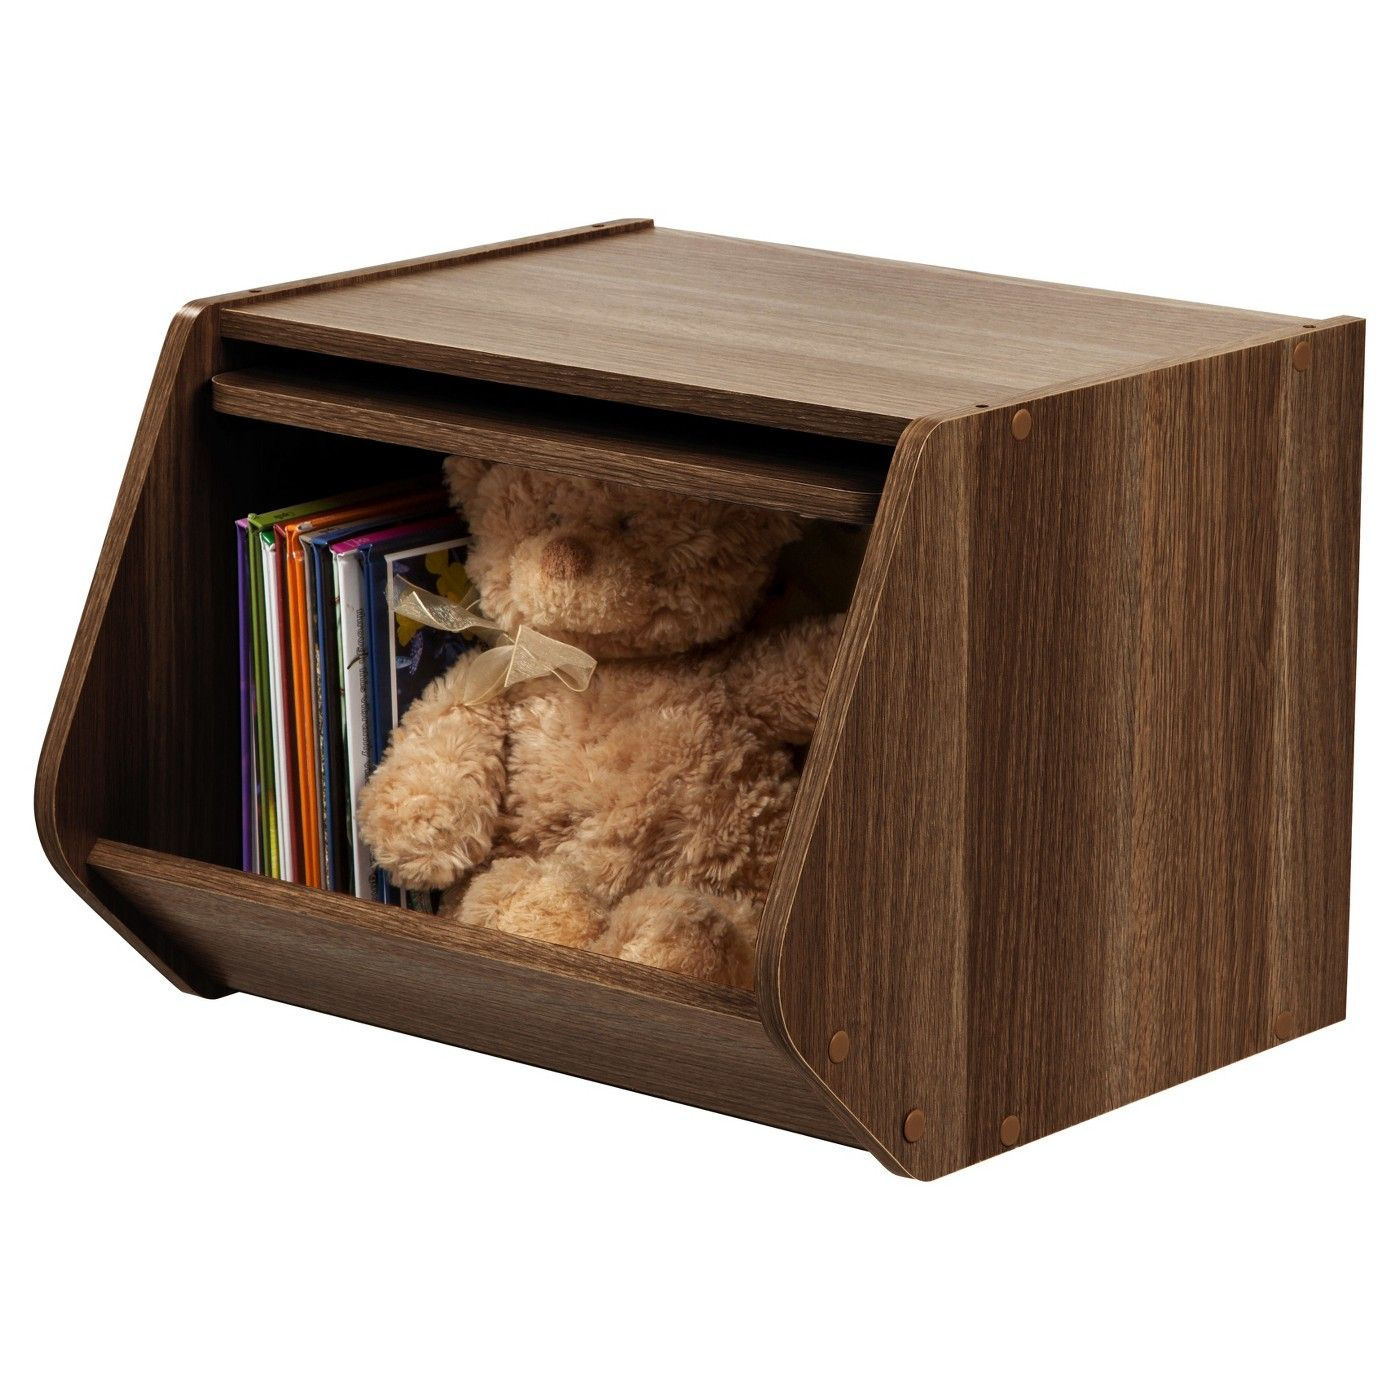 Iris Stacking Storage Box With Door Image 2 Of 5